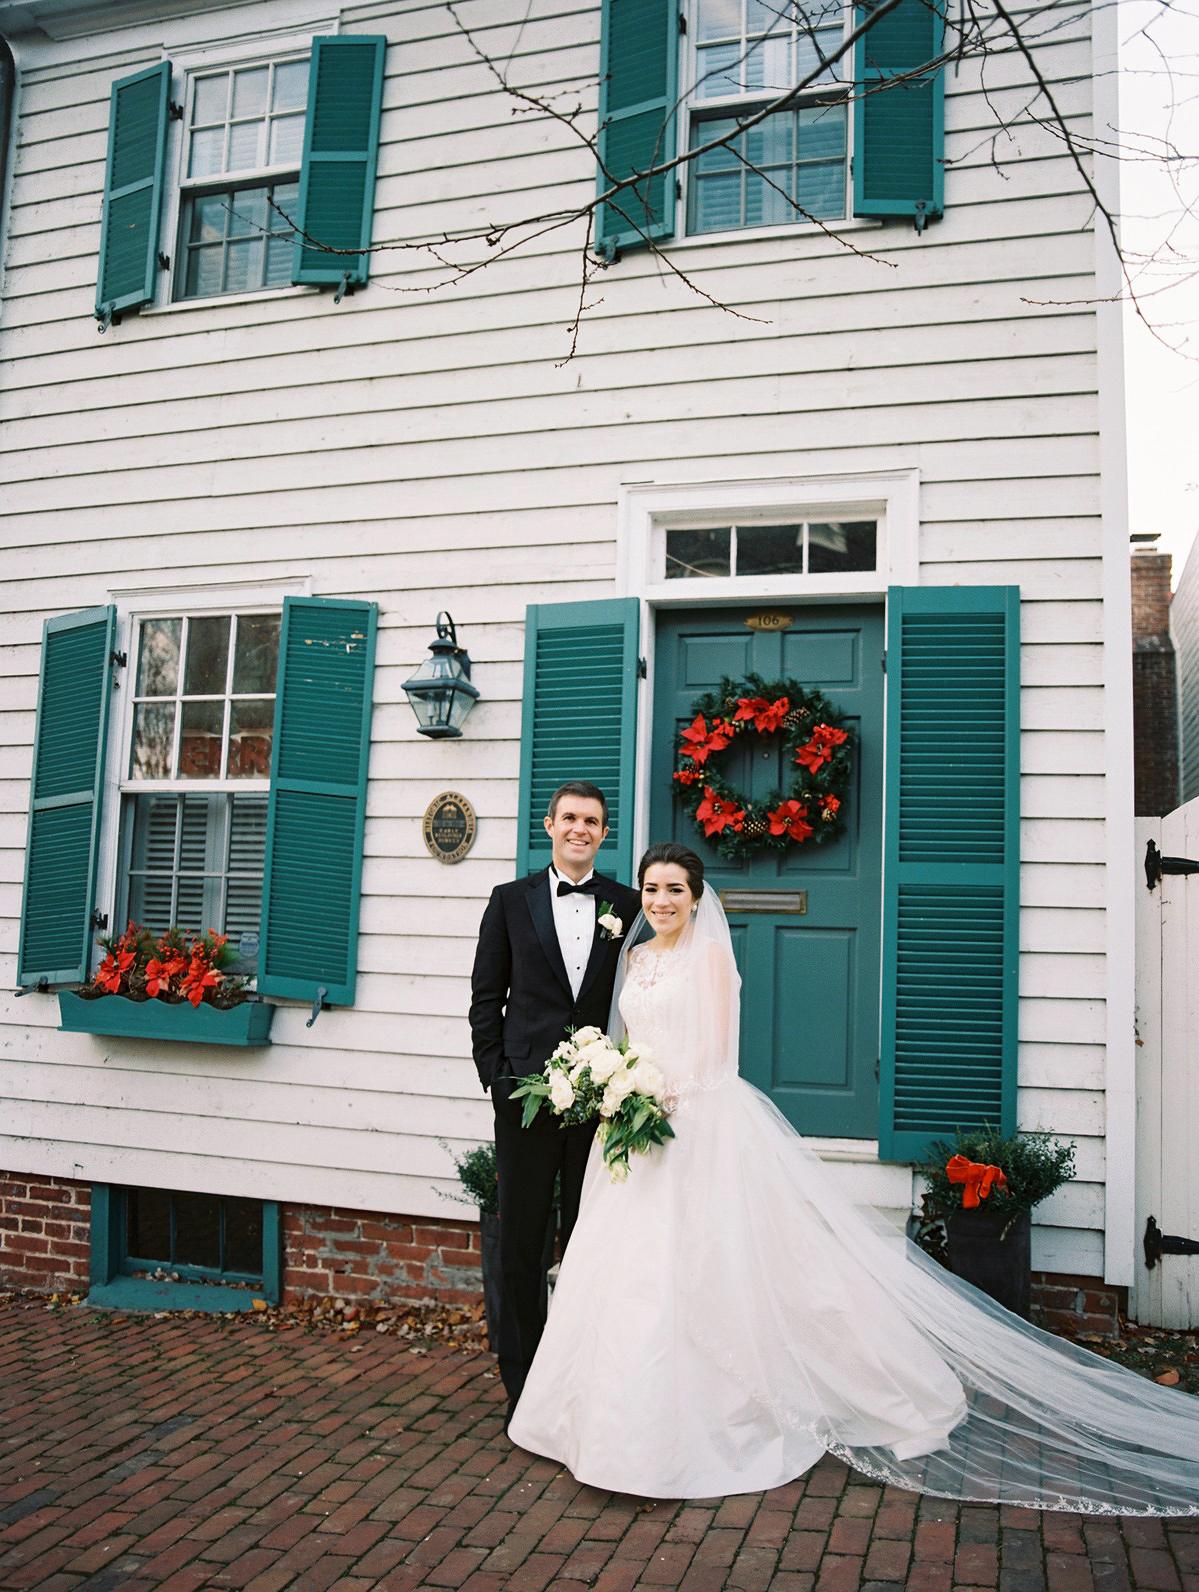 celina rob wedding virginia couple house